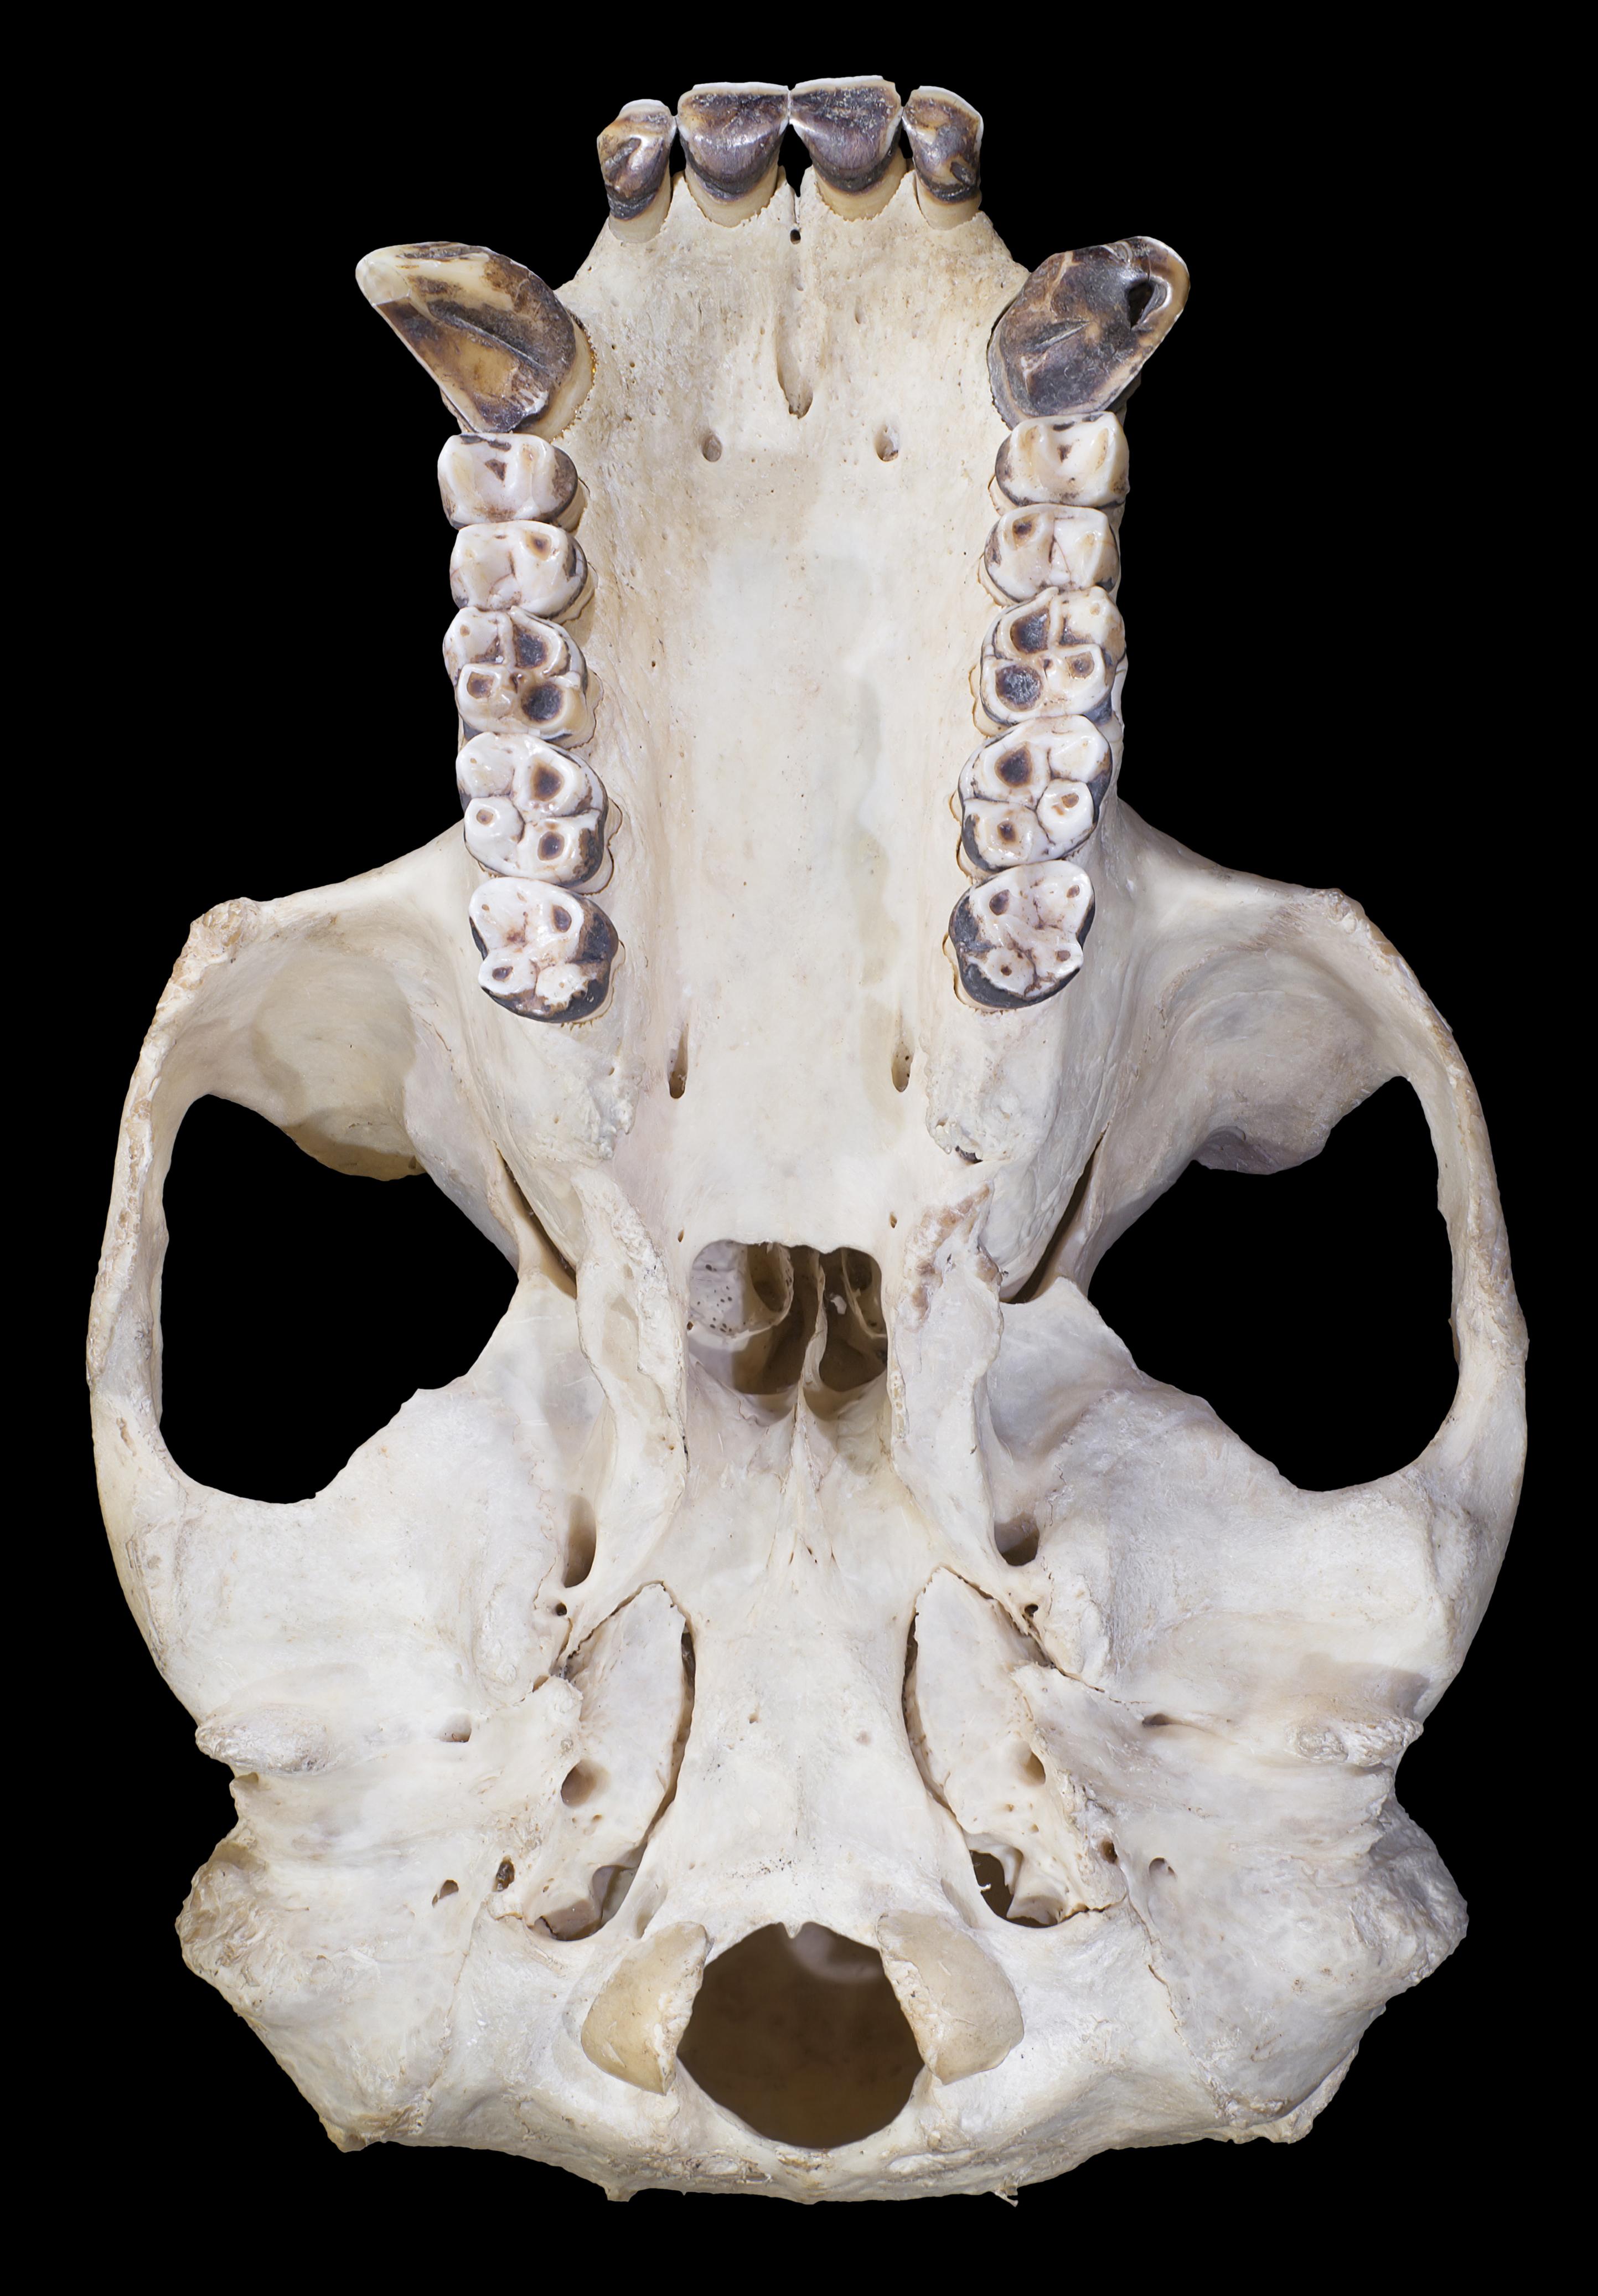 File:Gorilla Male skull base.png - Wikimedia Commons